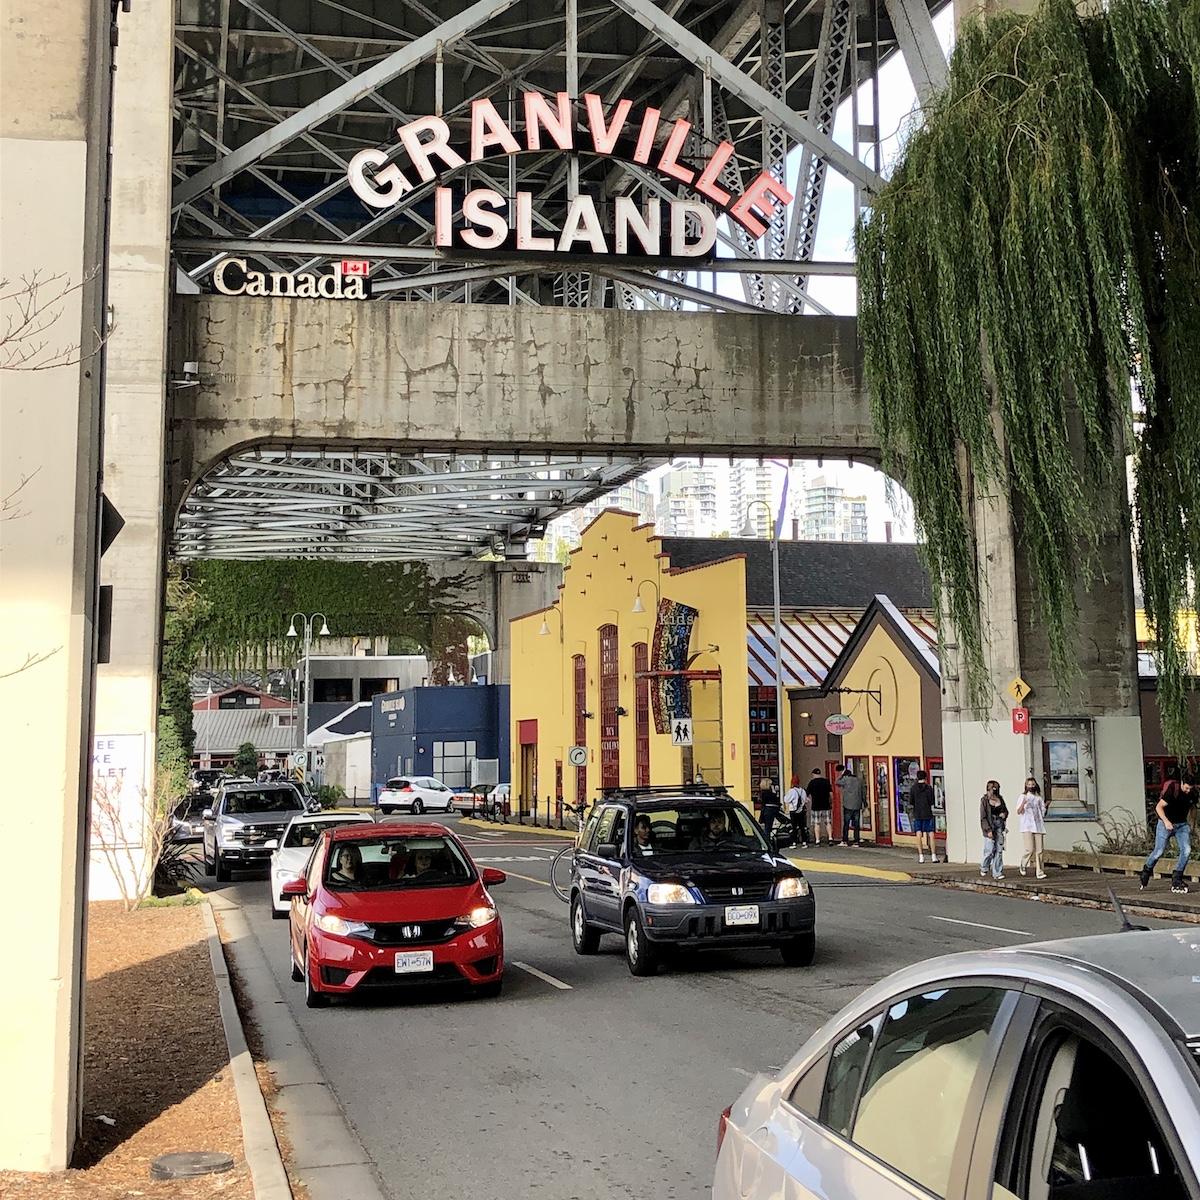 Entrance to the Granville Island Public Market